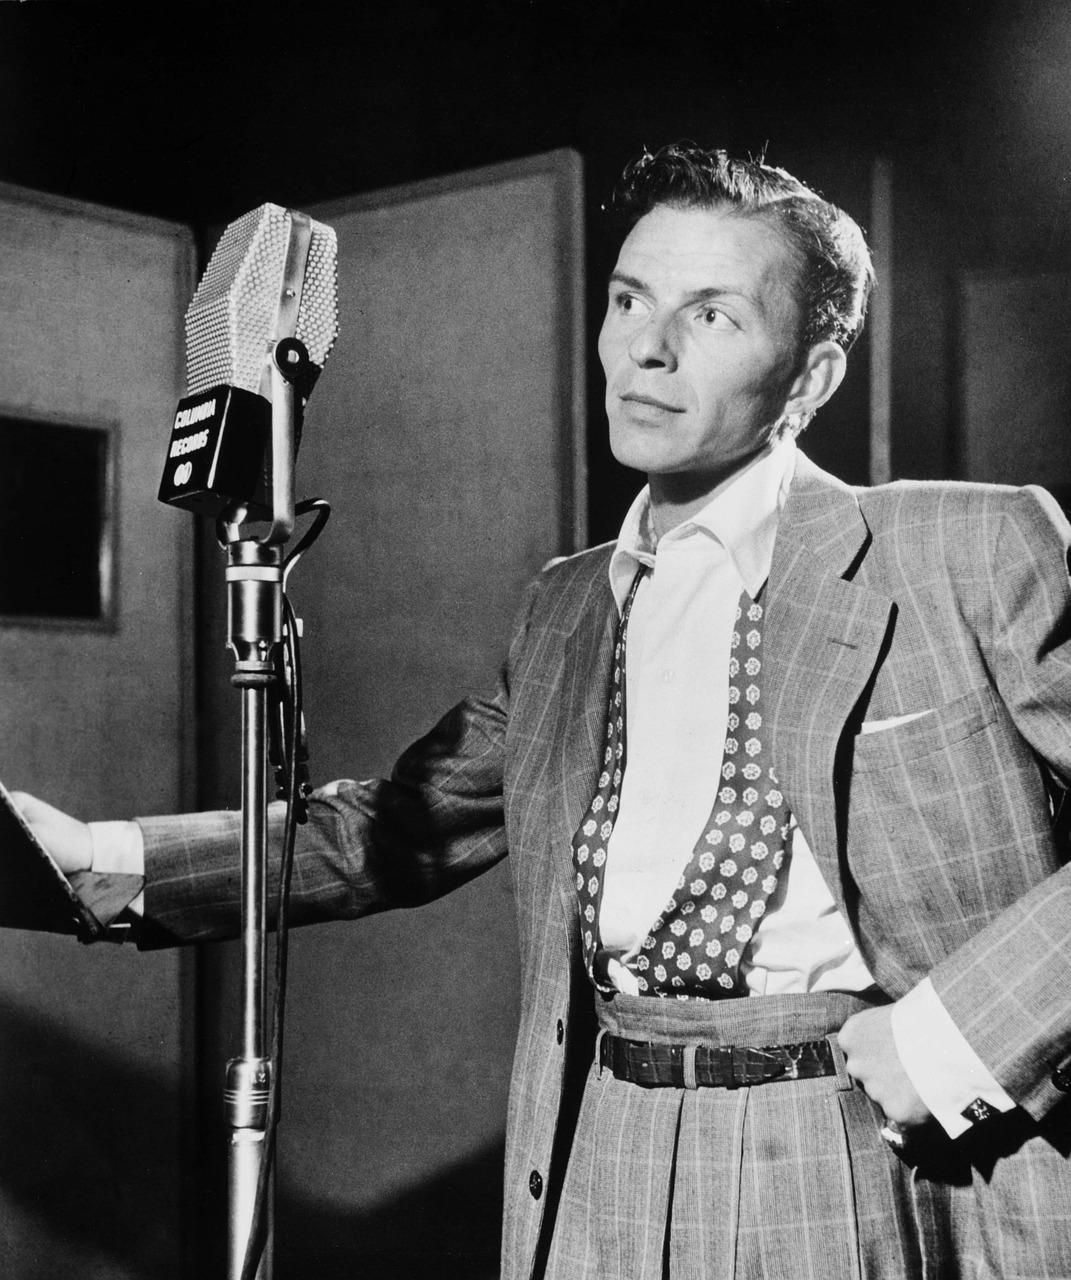 Poet Frank Sinatra